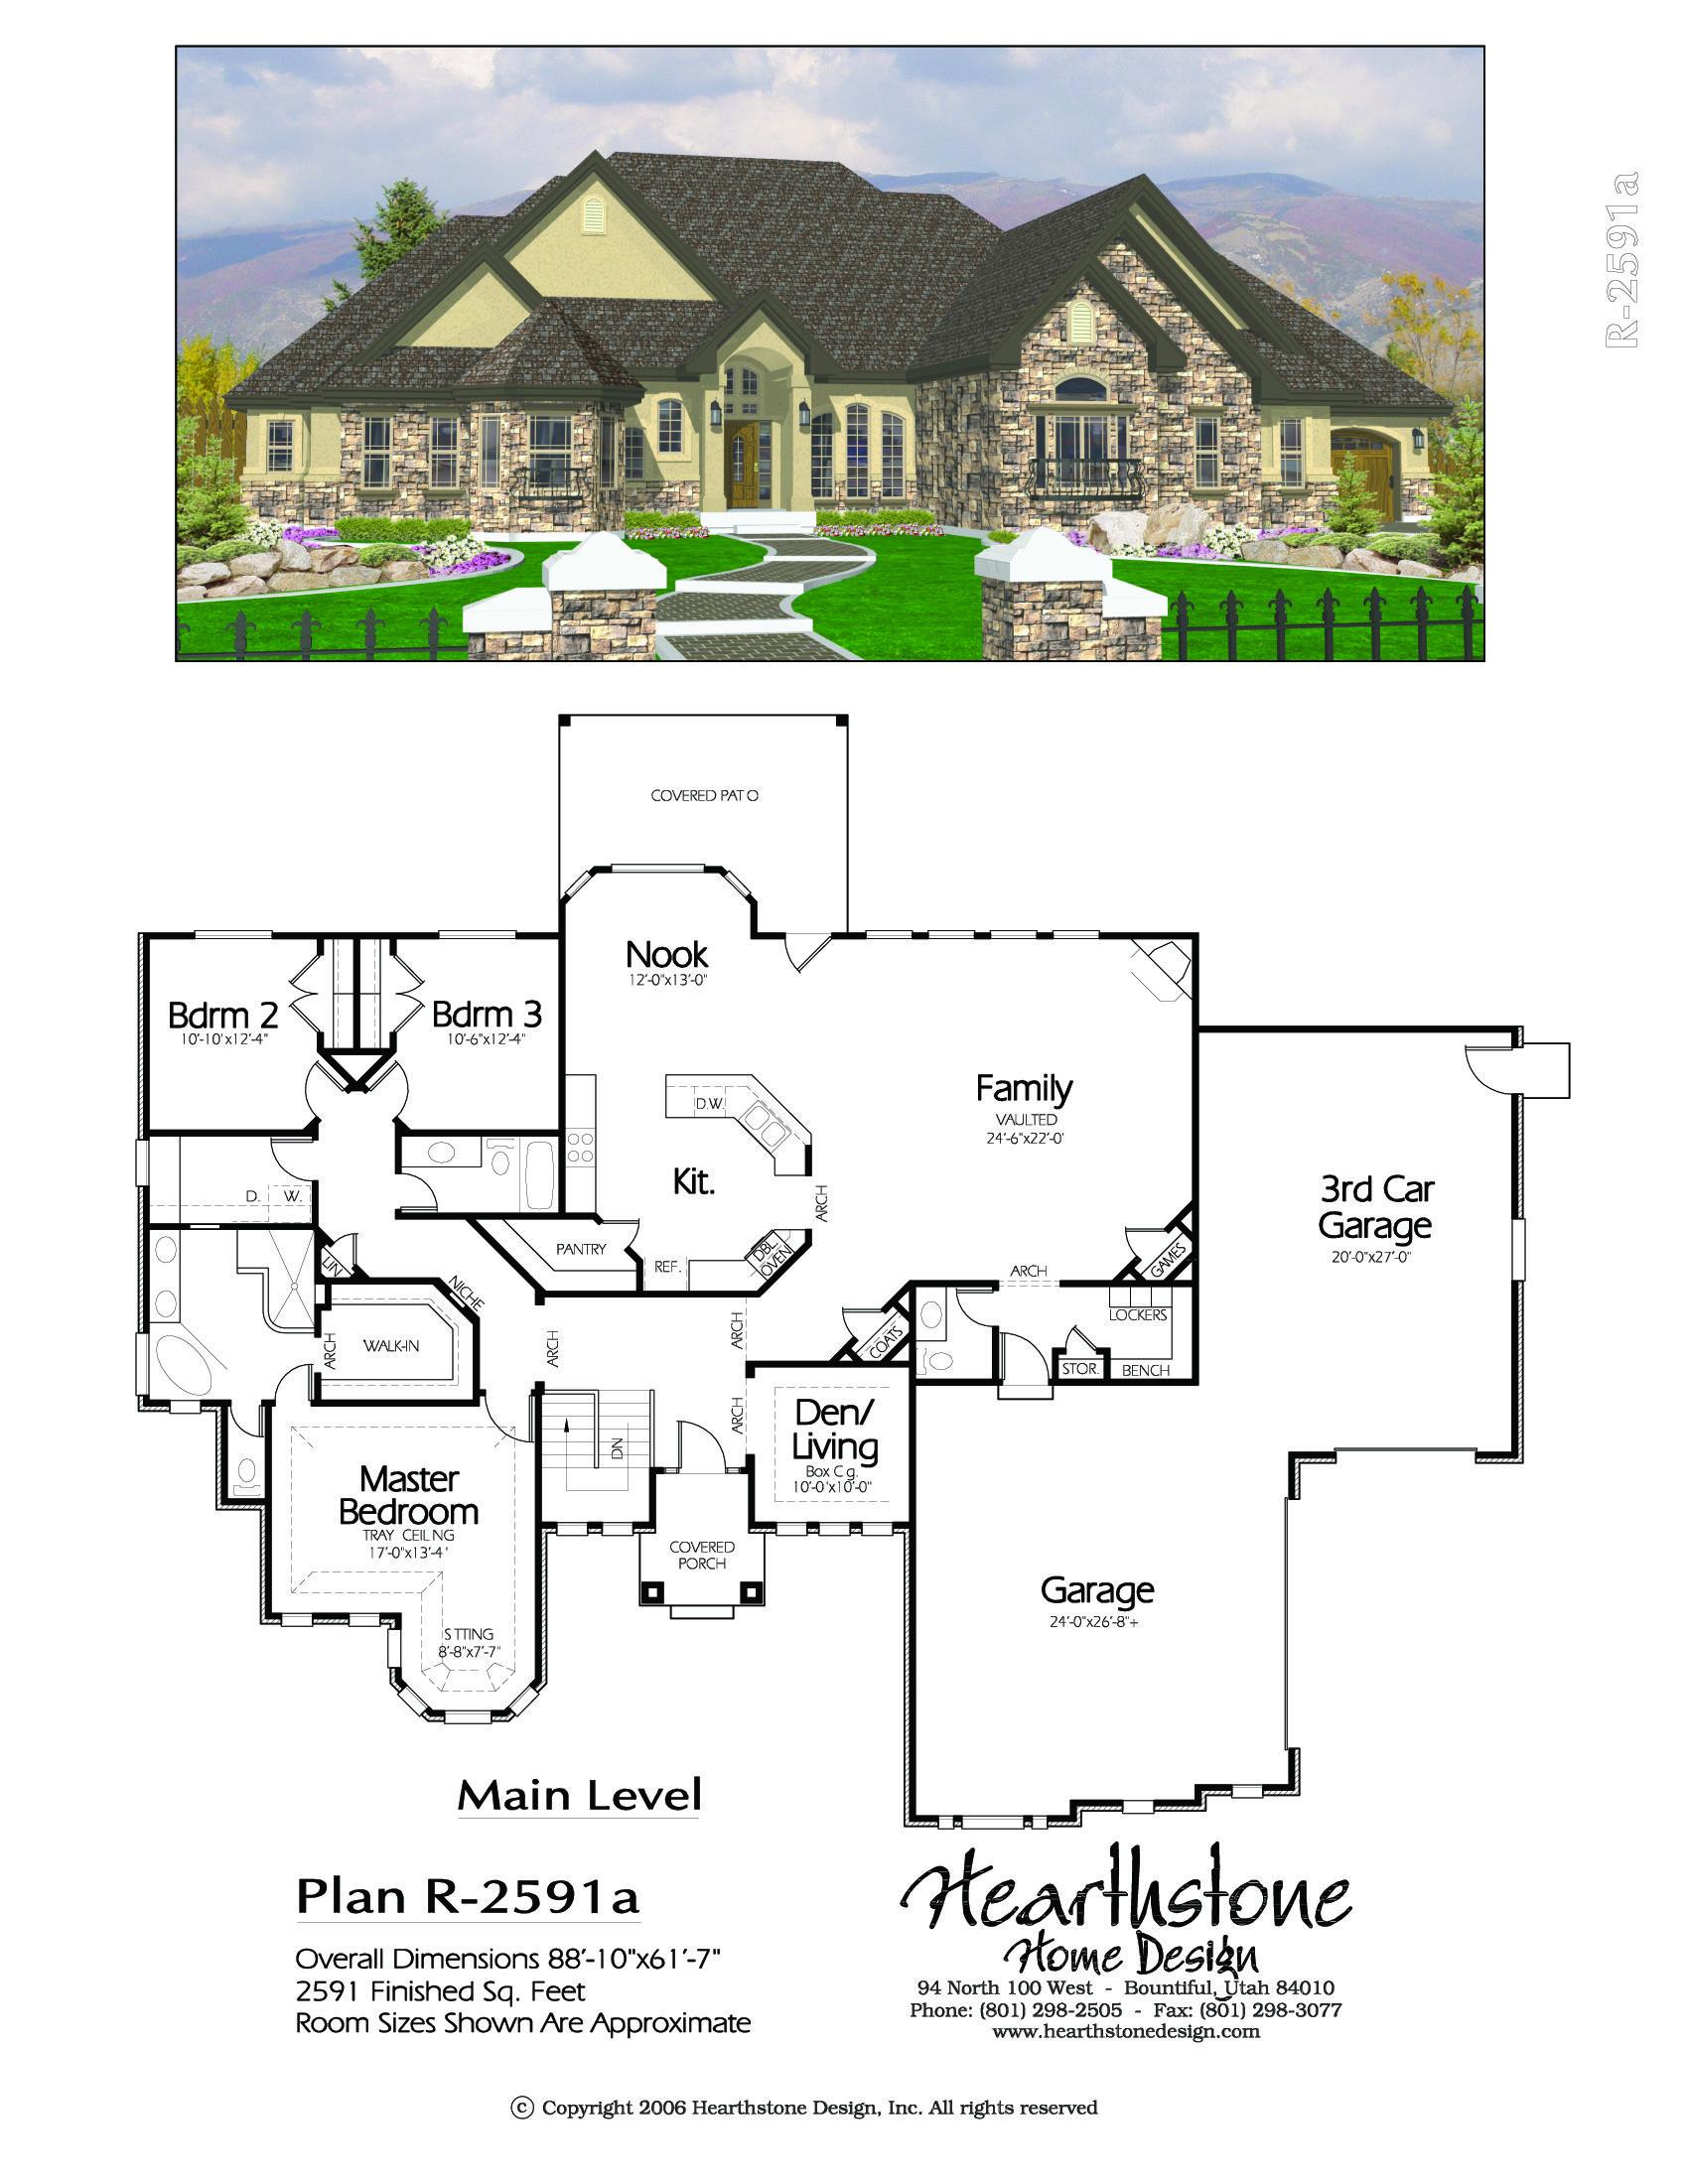 R 2591a Hearthstone Home Design My House Plans Dream House Plans Rambler House Plans